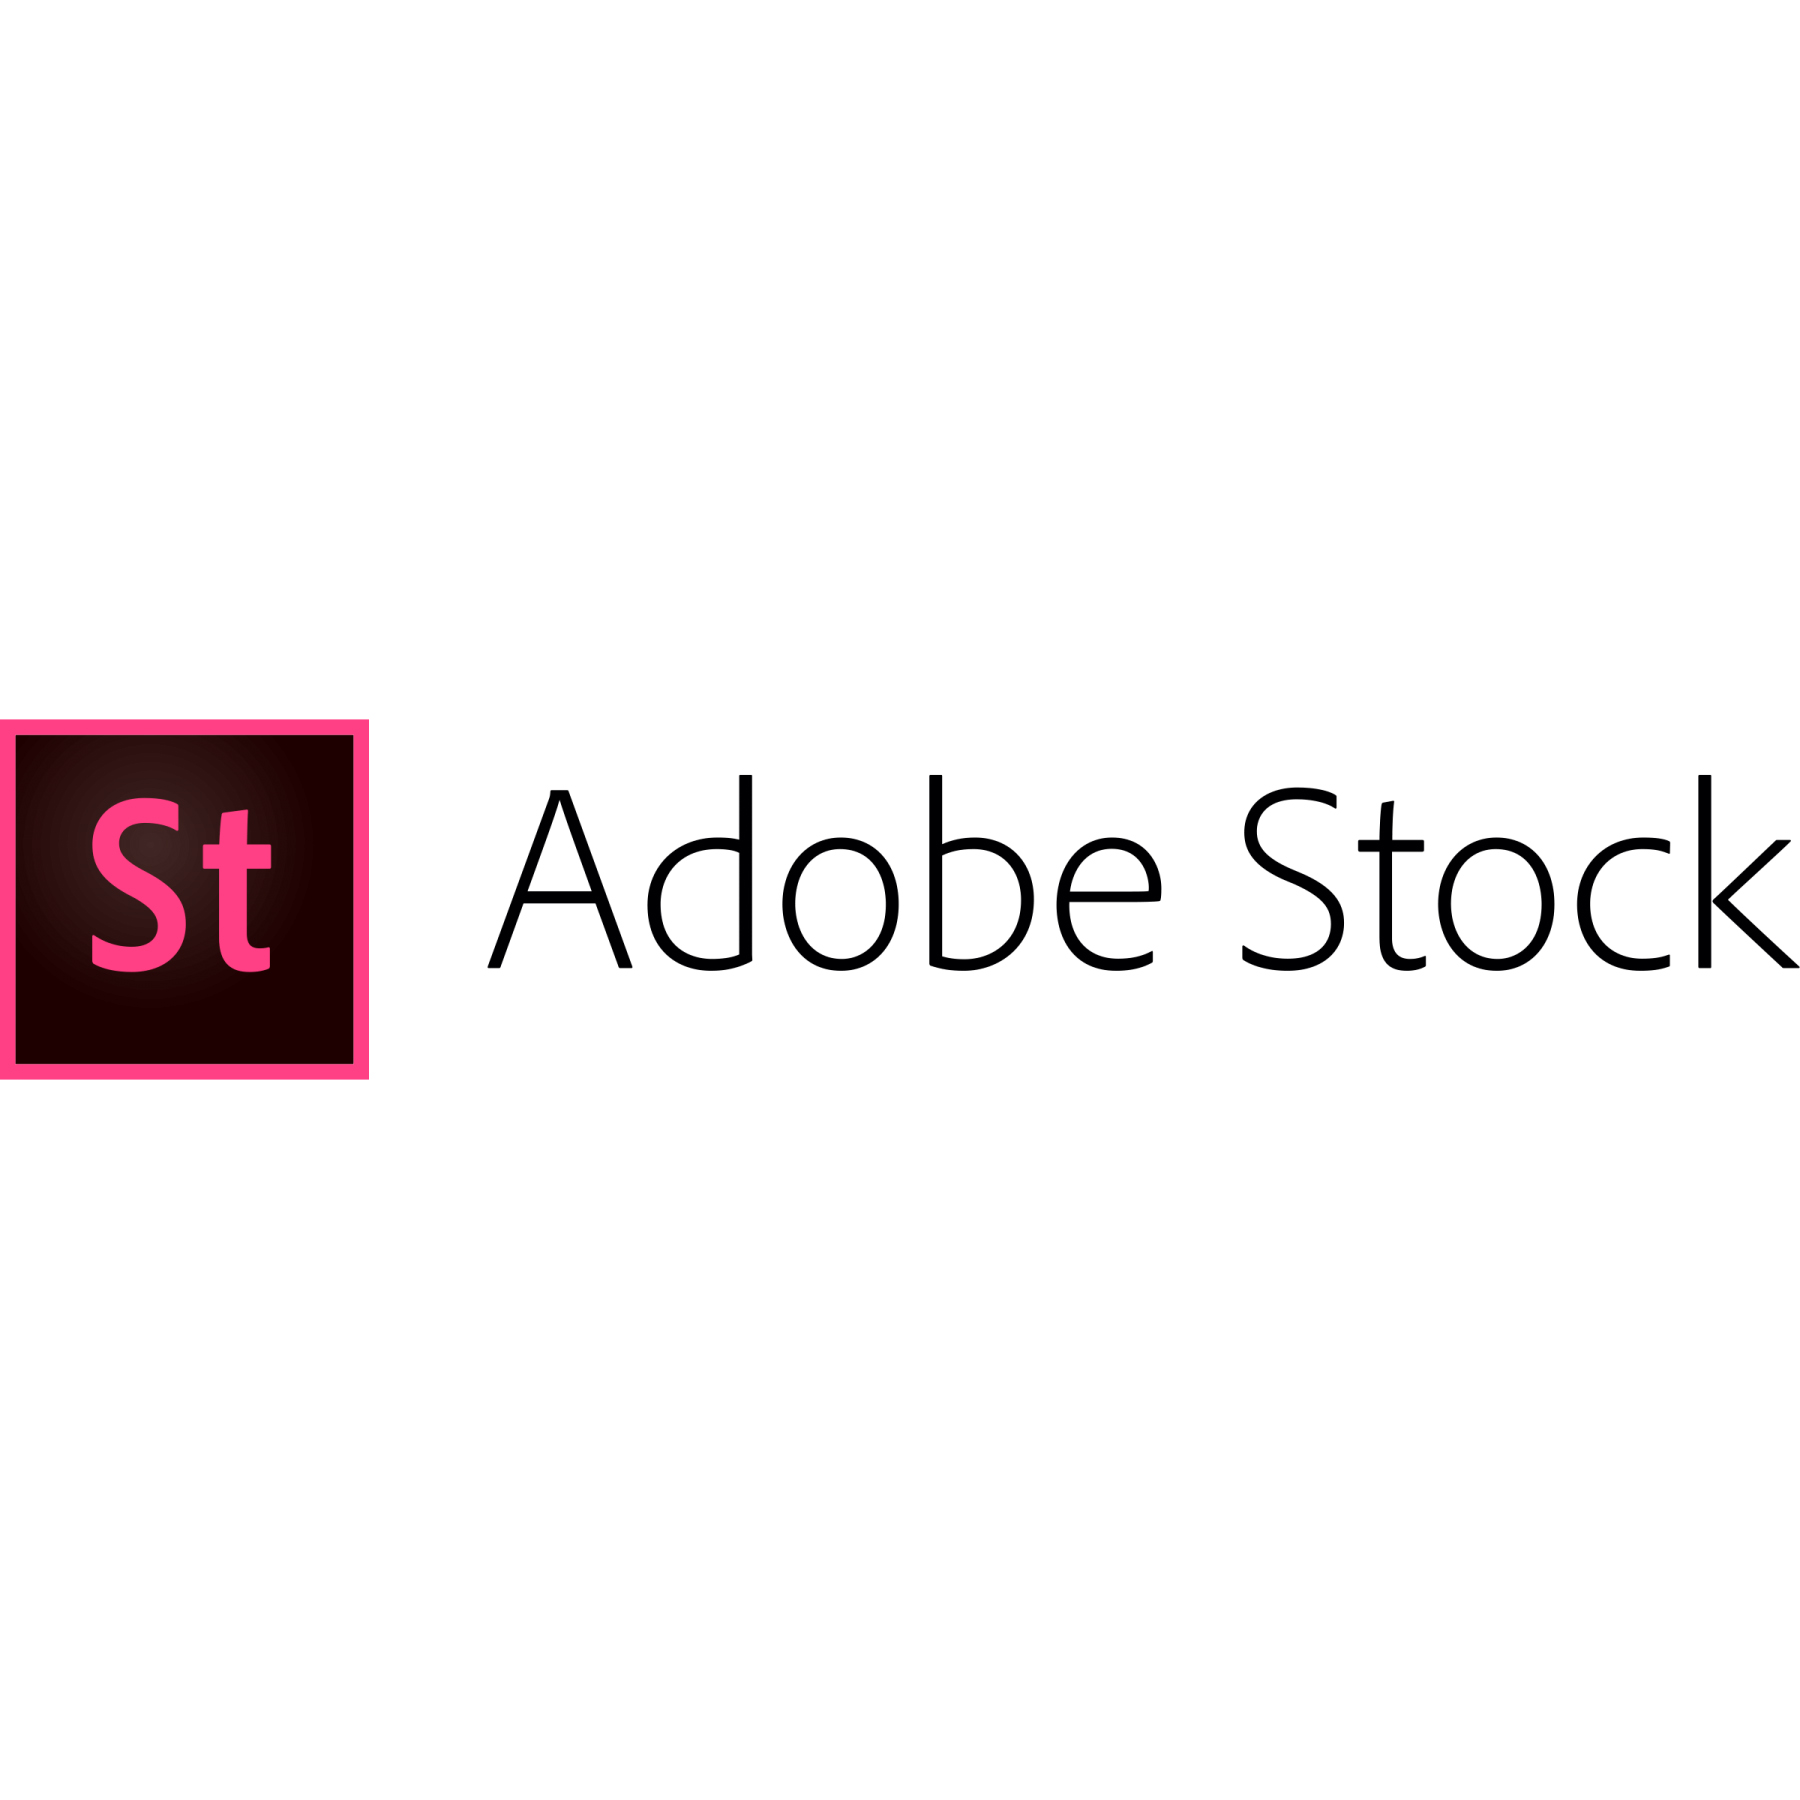 Adobe_Stock_Logo_sq_2018.jpg